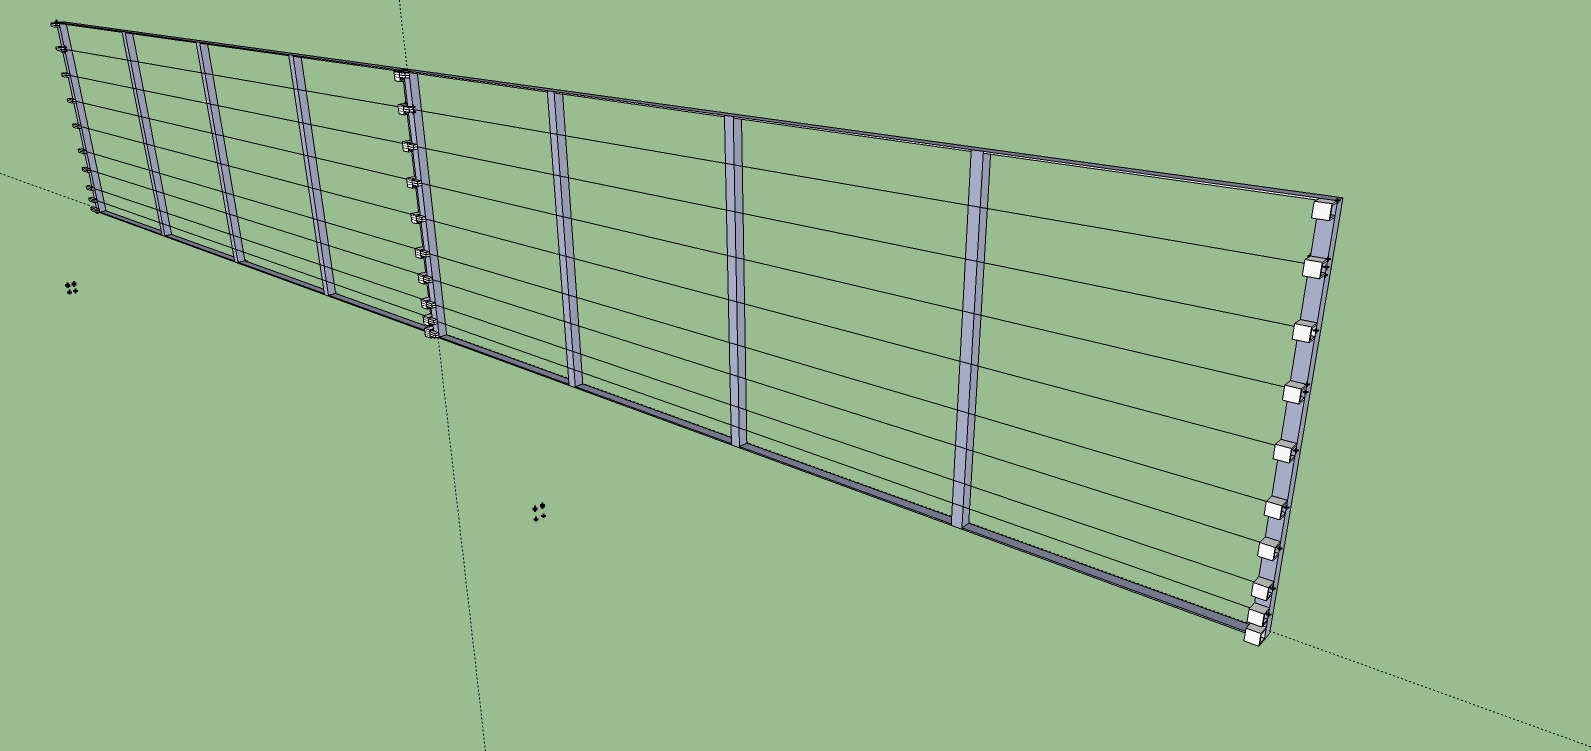 Modular Rigid Electro-Fence